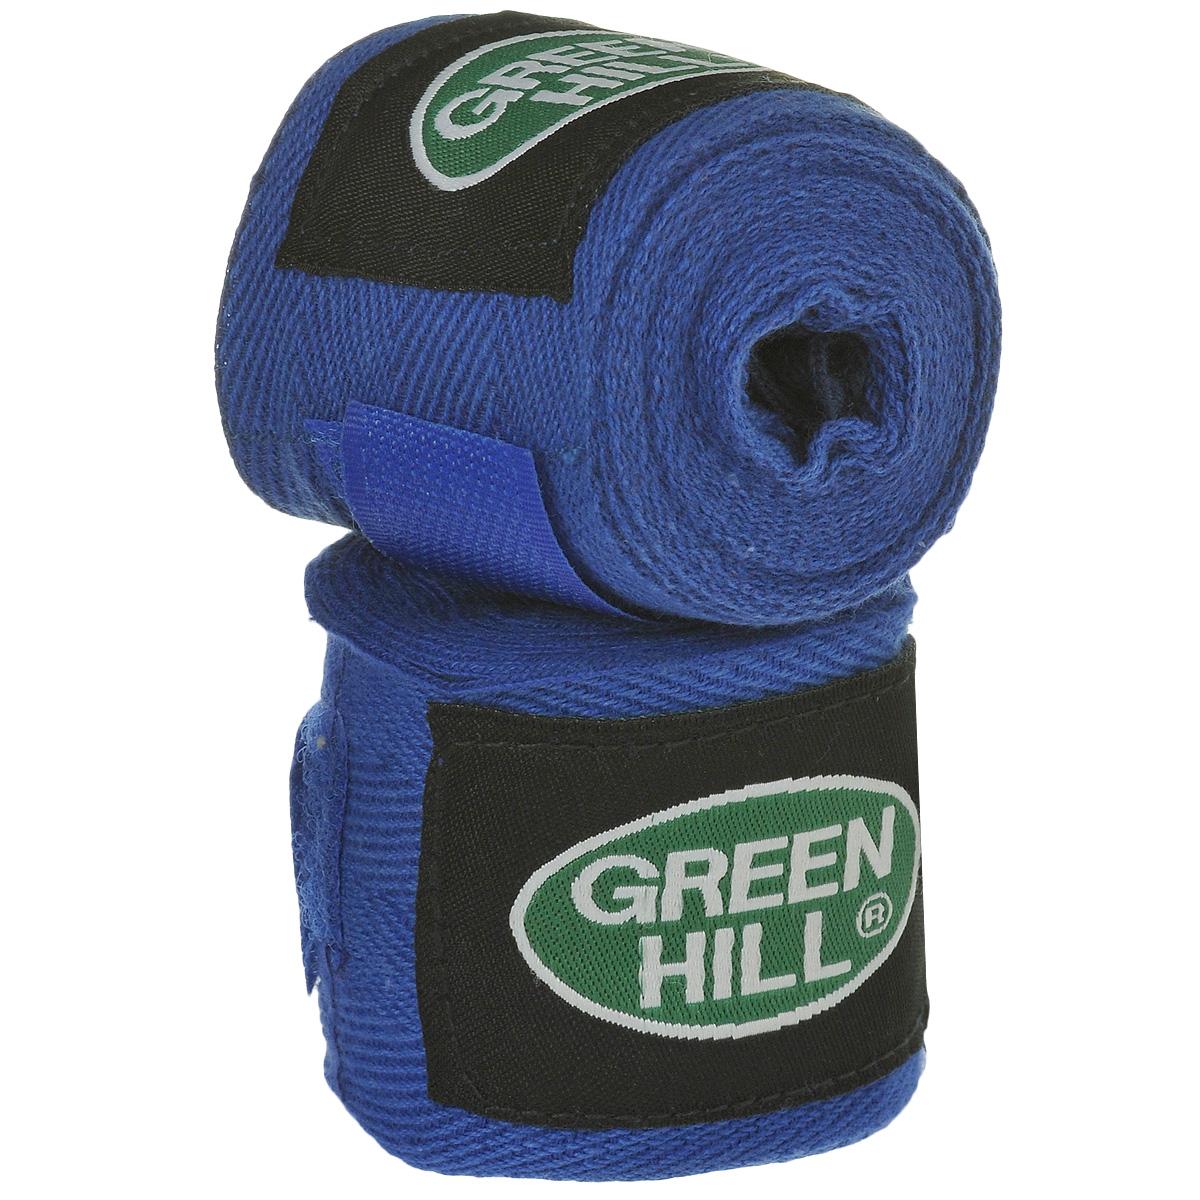 "Green Hill Бинты боксерские ""Green Hill"", хлопок, цвет: синий, 3,5 м, 2 шт"